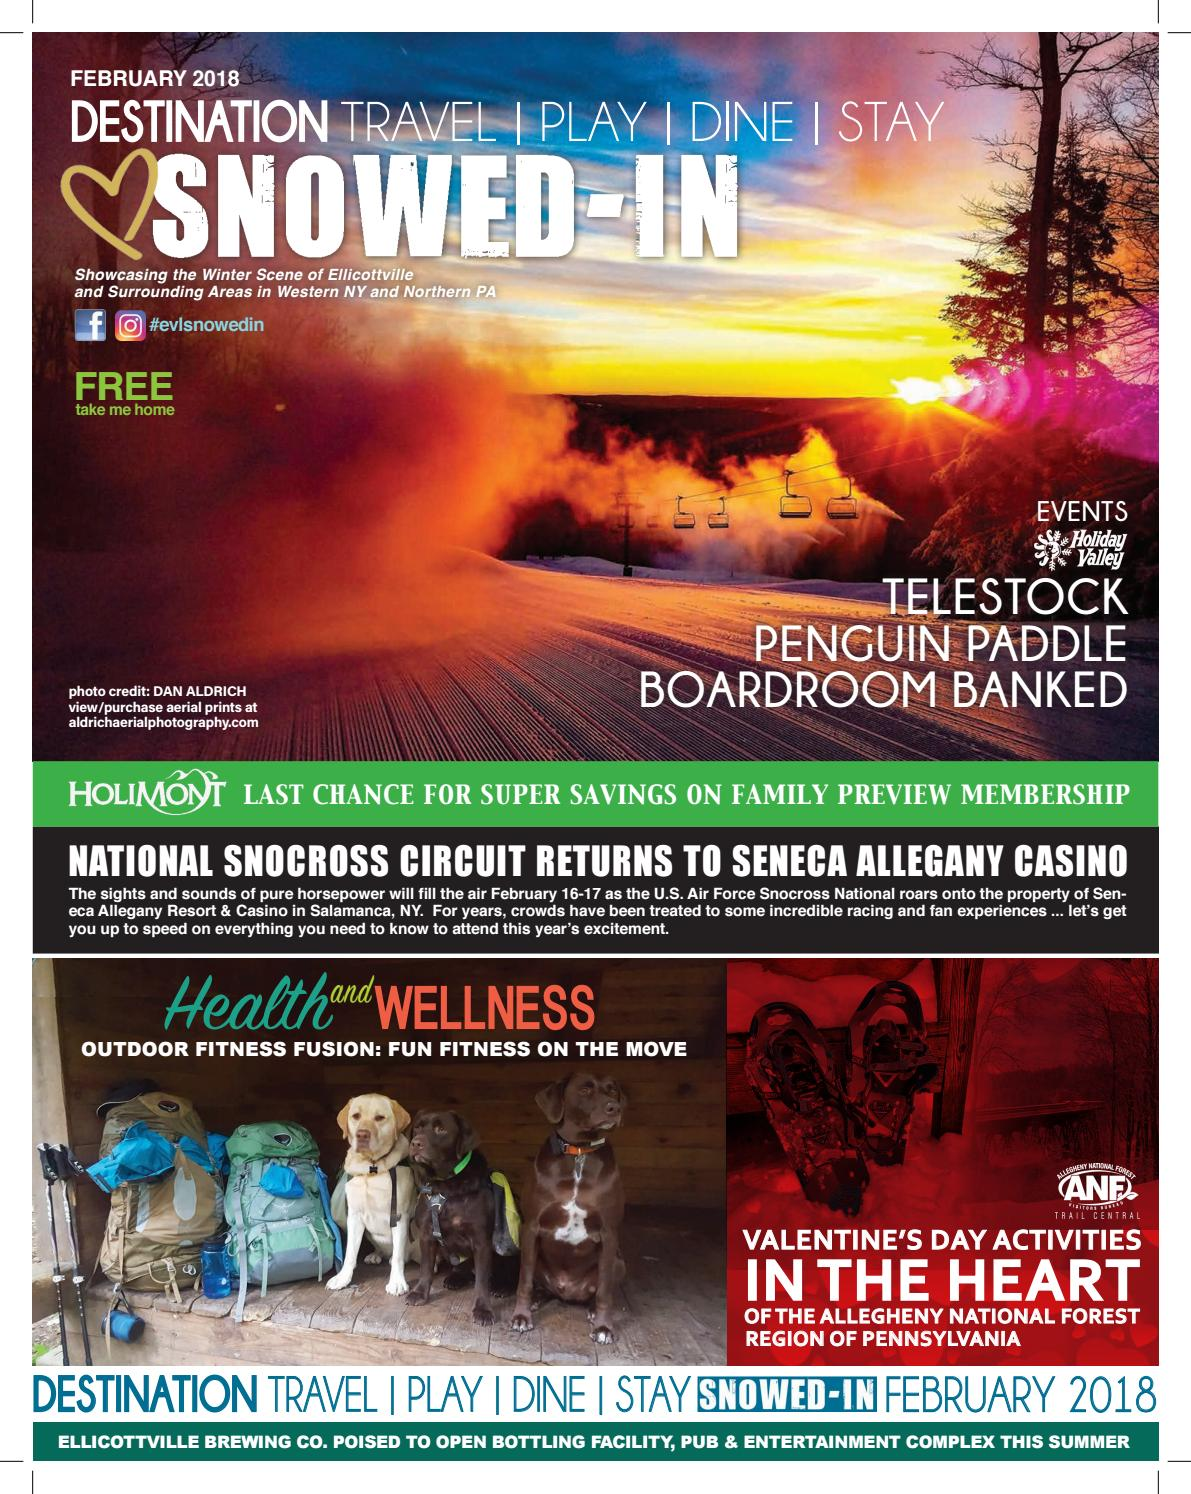 ed011f8f0512 Ellicottville SNOWED-IN February 2018 by Brenda Perks - issuu